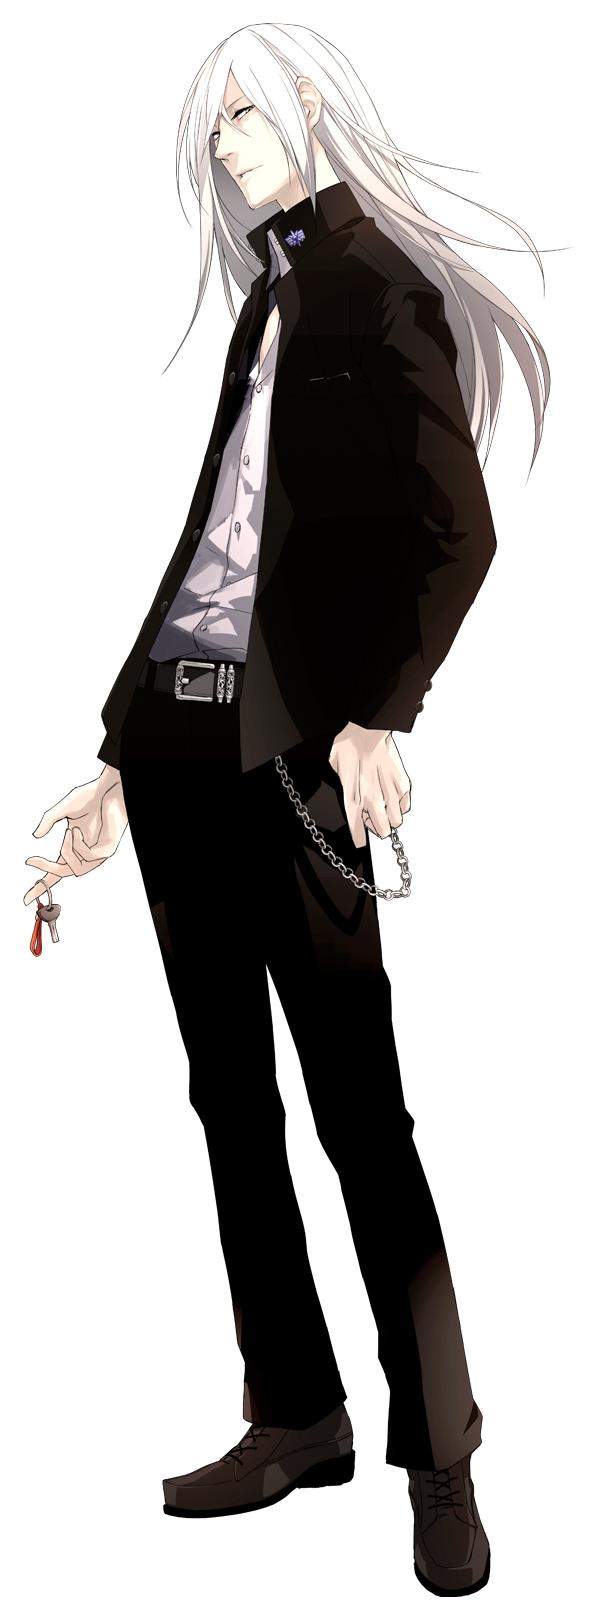 Tags: Anime, Nono Kanako, PRINCE OF STRIDE, Kuga Kyosuke, Official Art, PNG Conversion